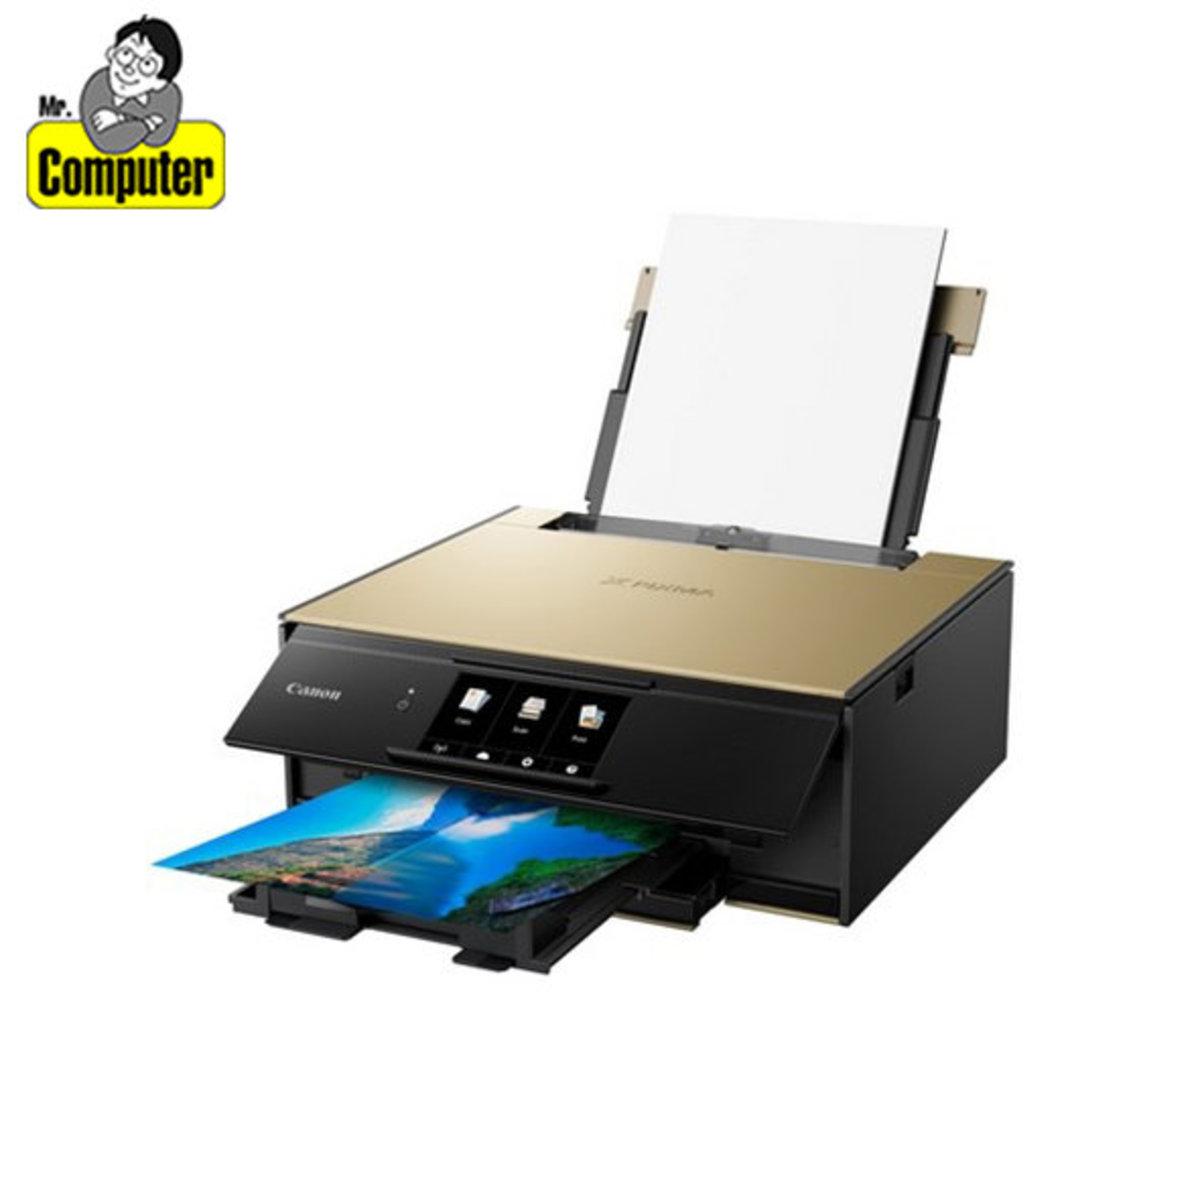 PIXMA TS9170 (GD) 3in1 multi-function printer